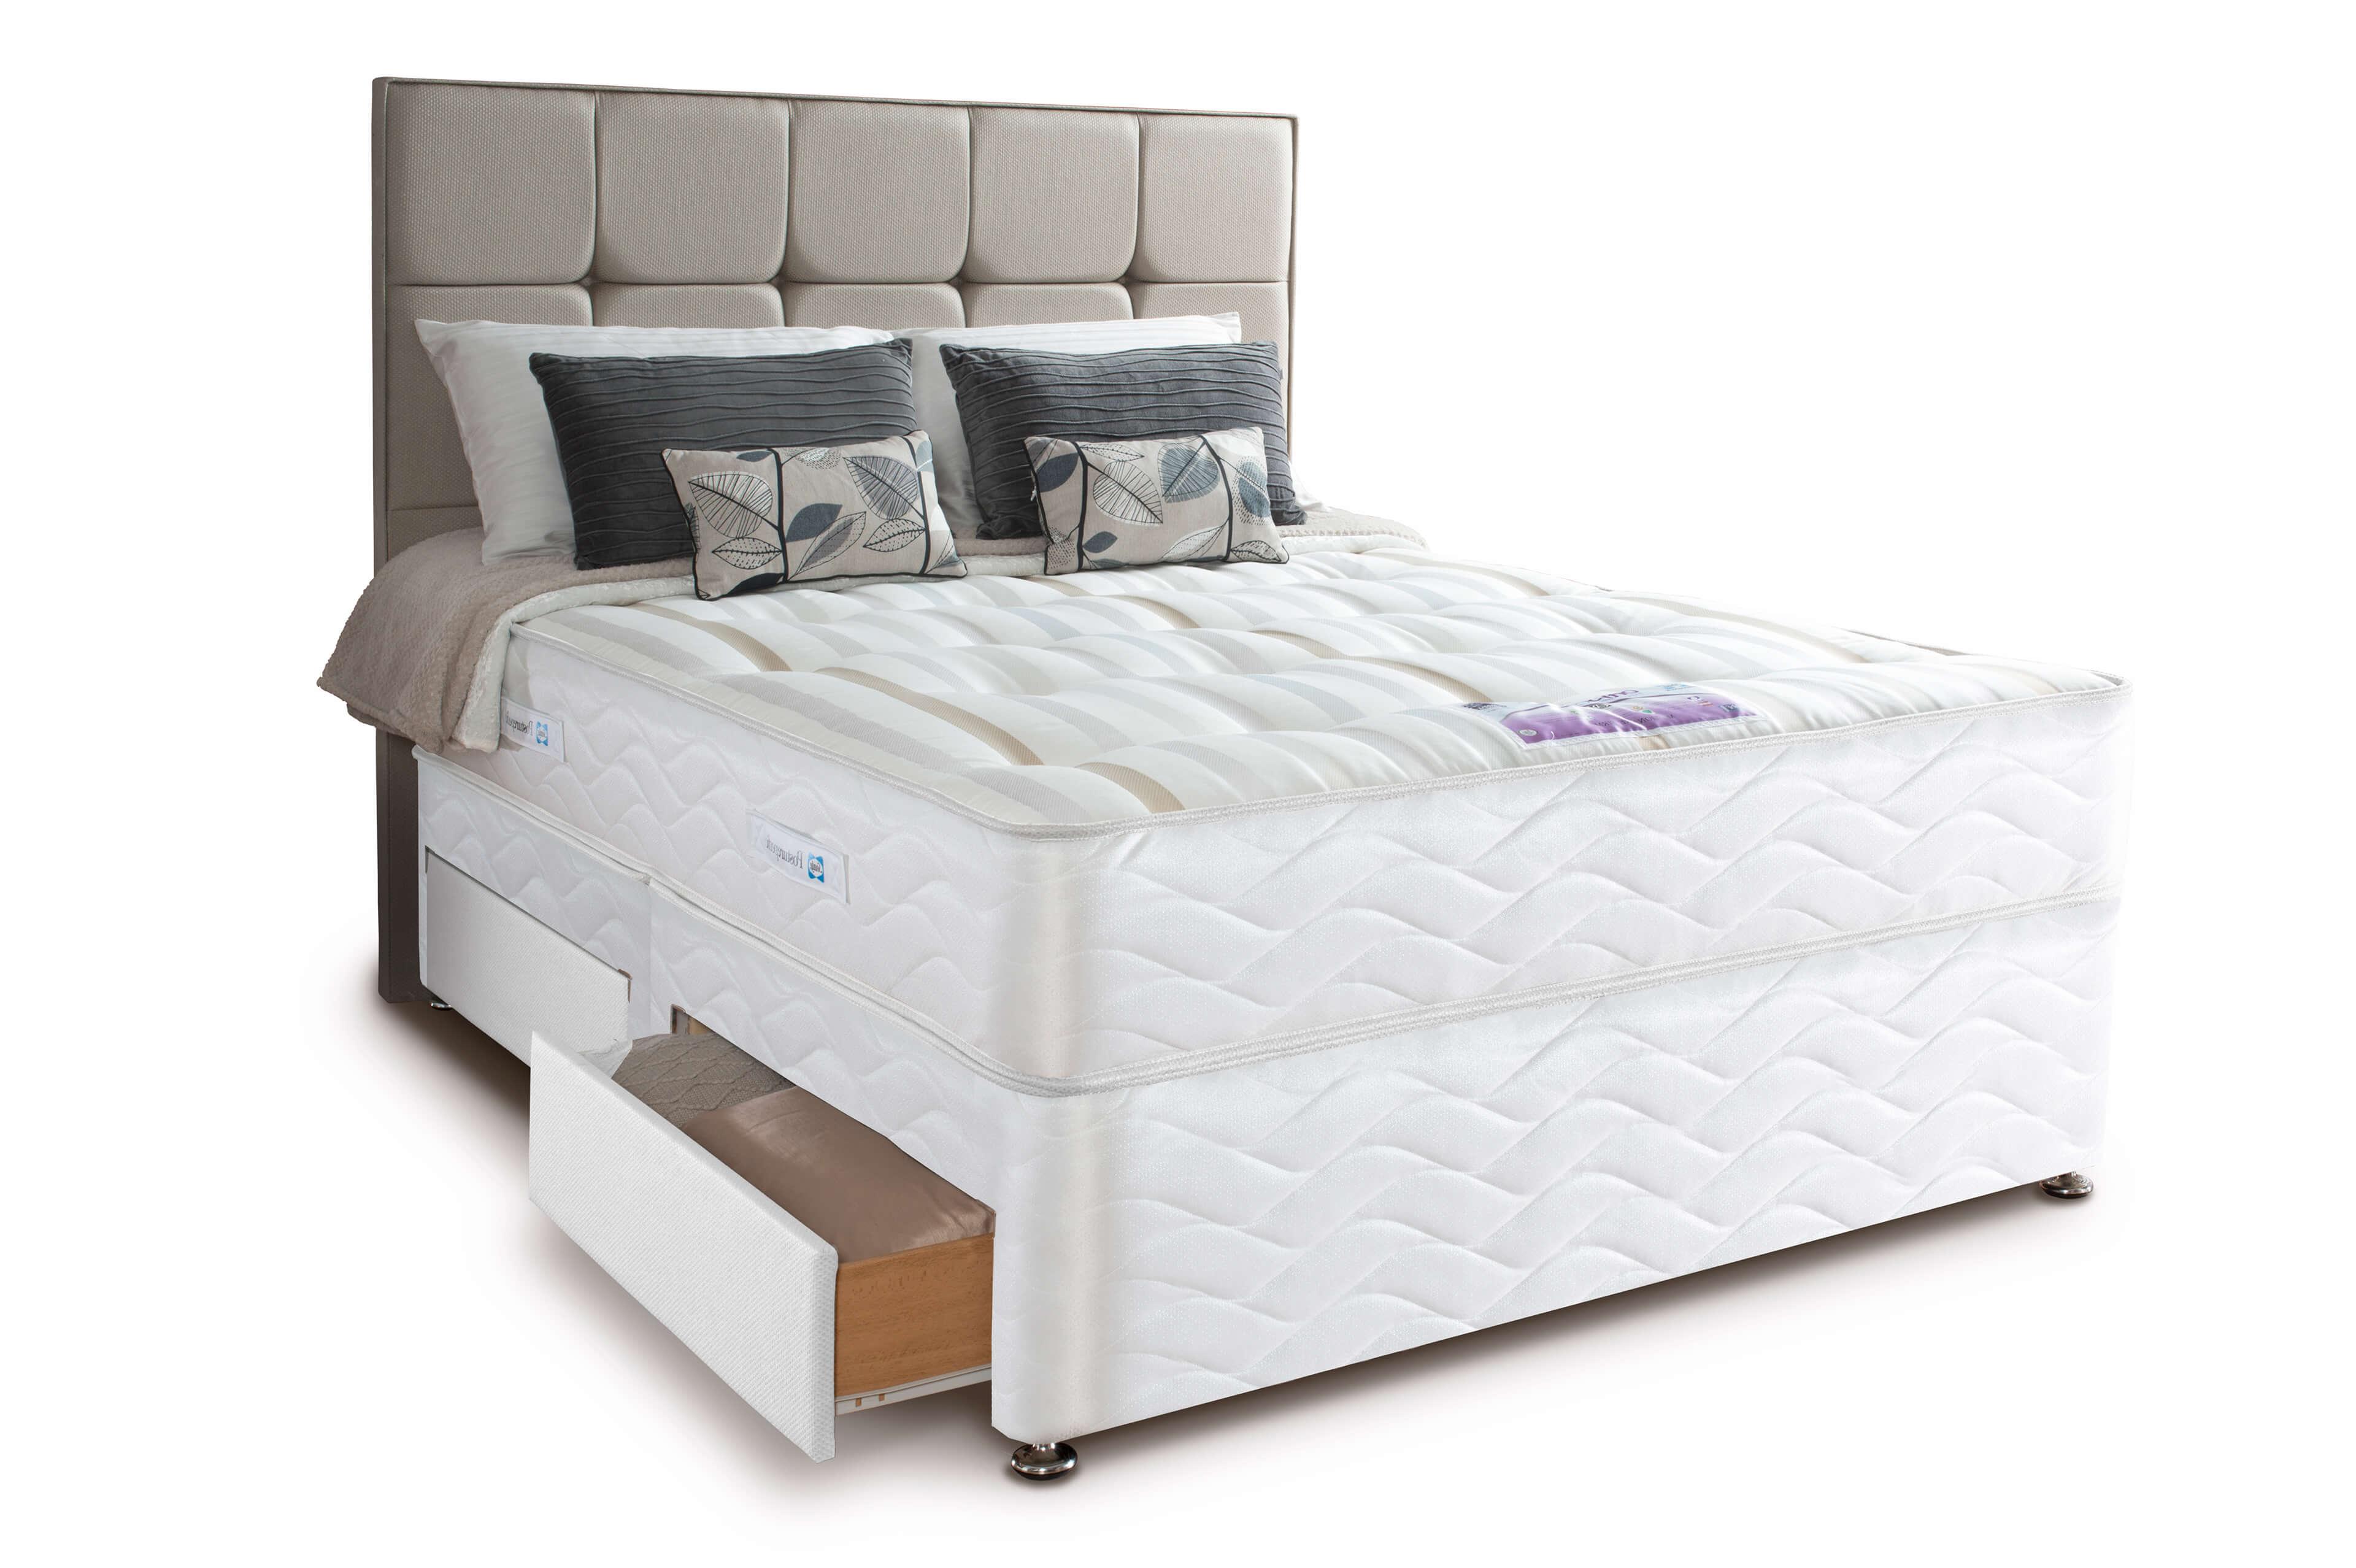 774272de508 Pearl Firm - Sweetdreams Bed Company